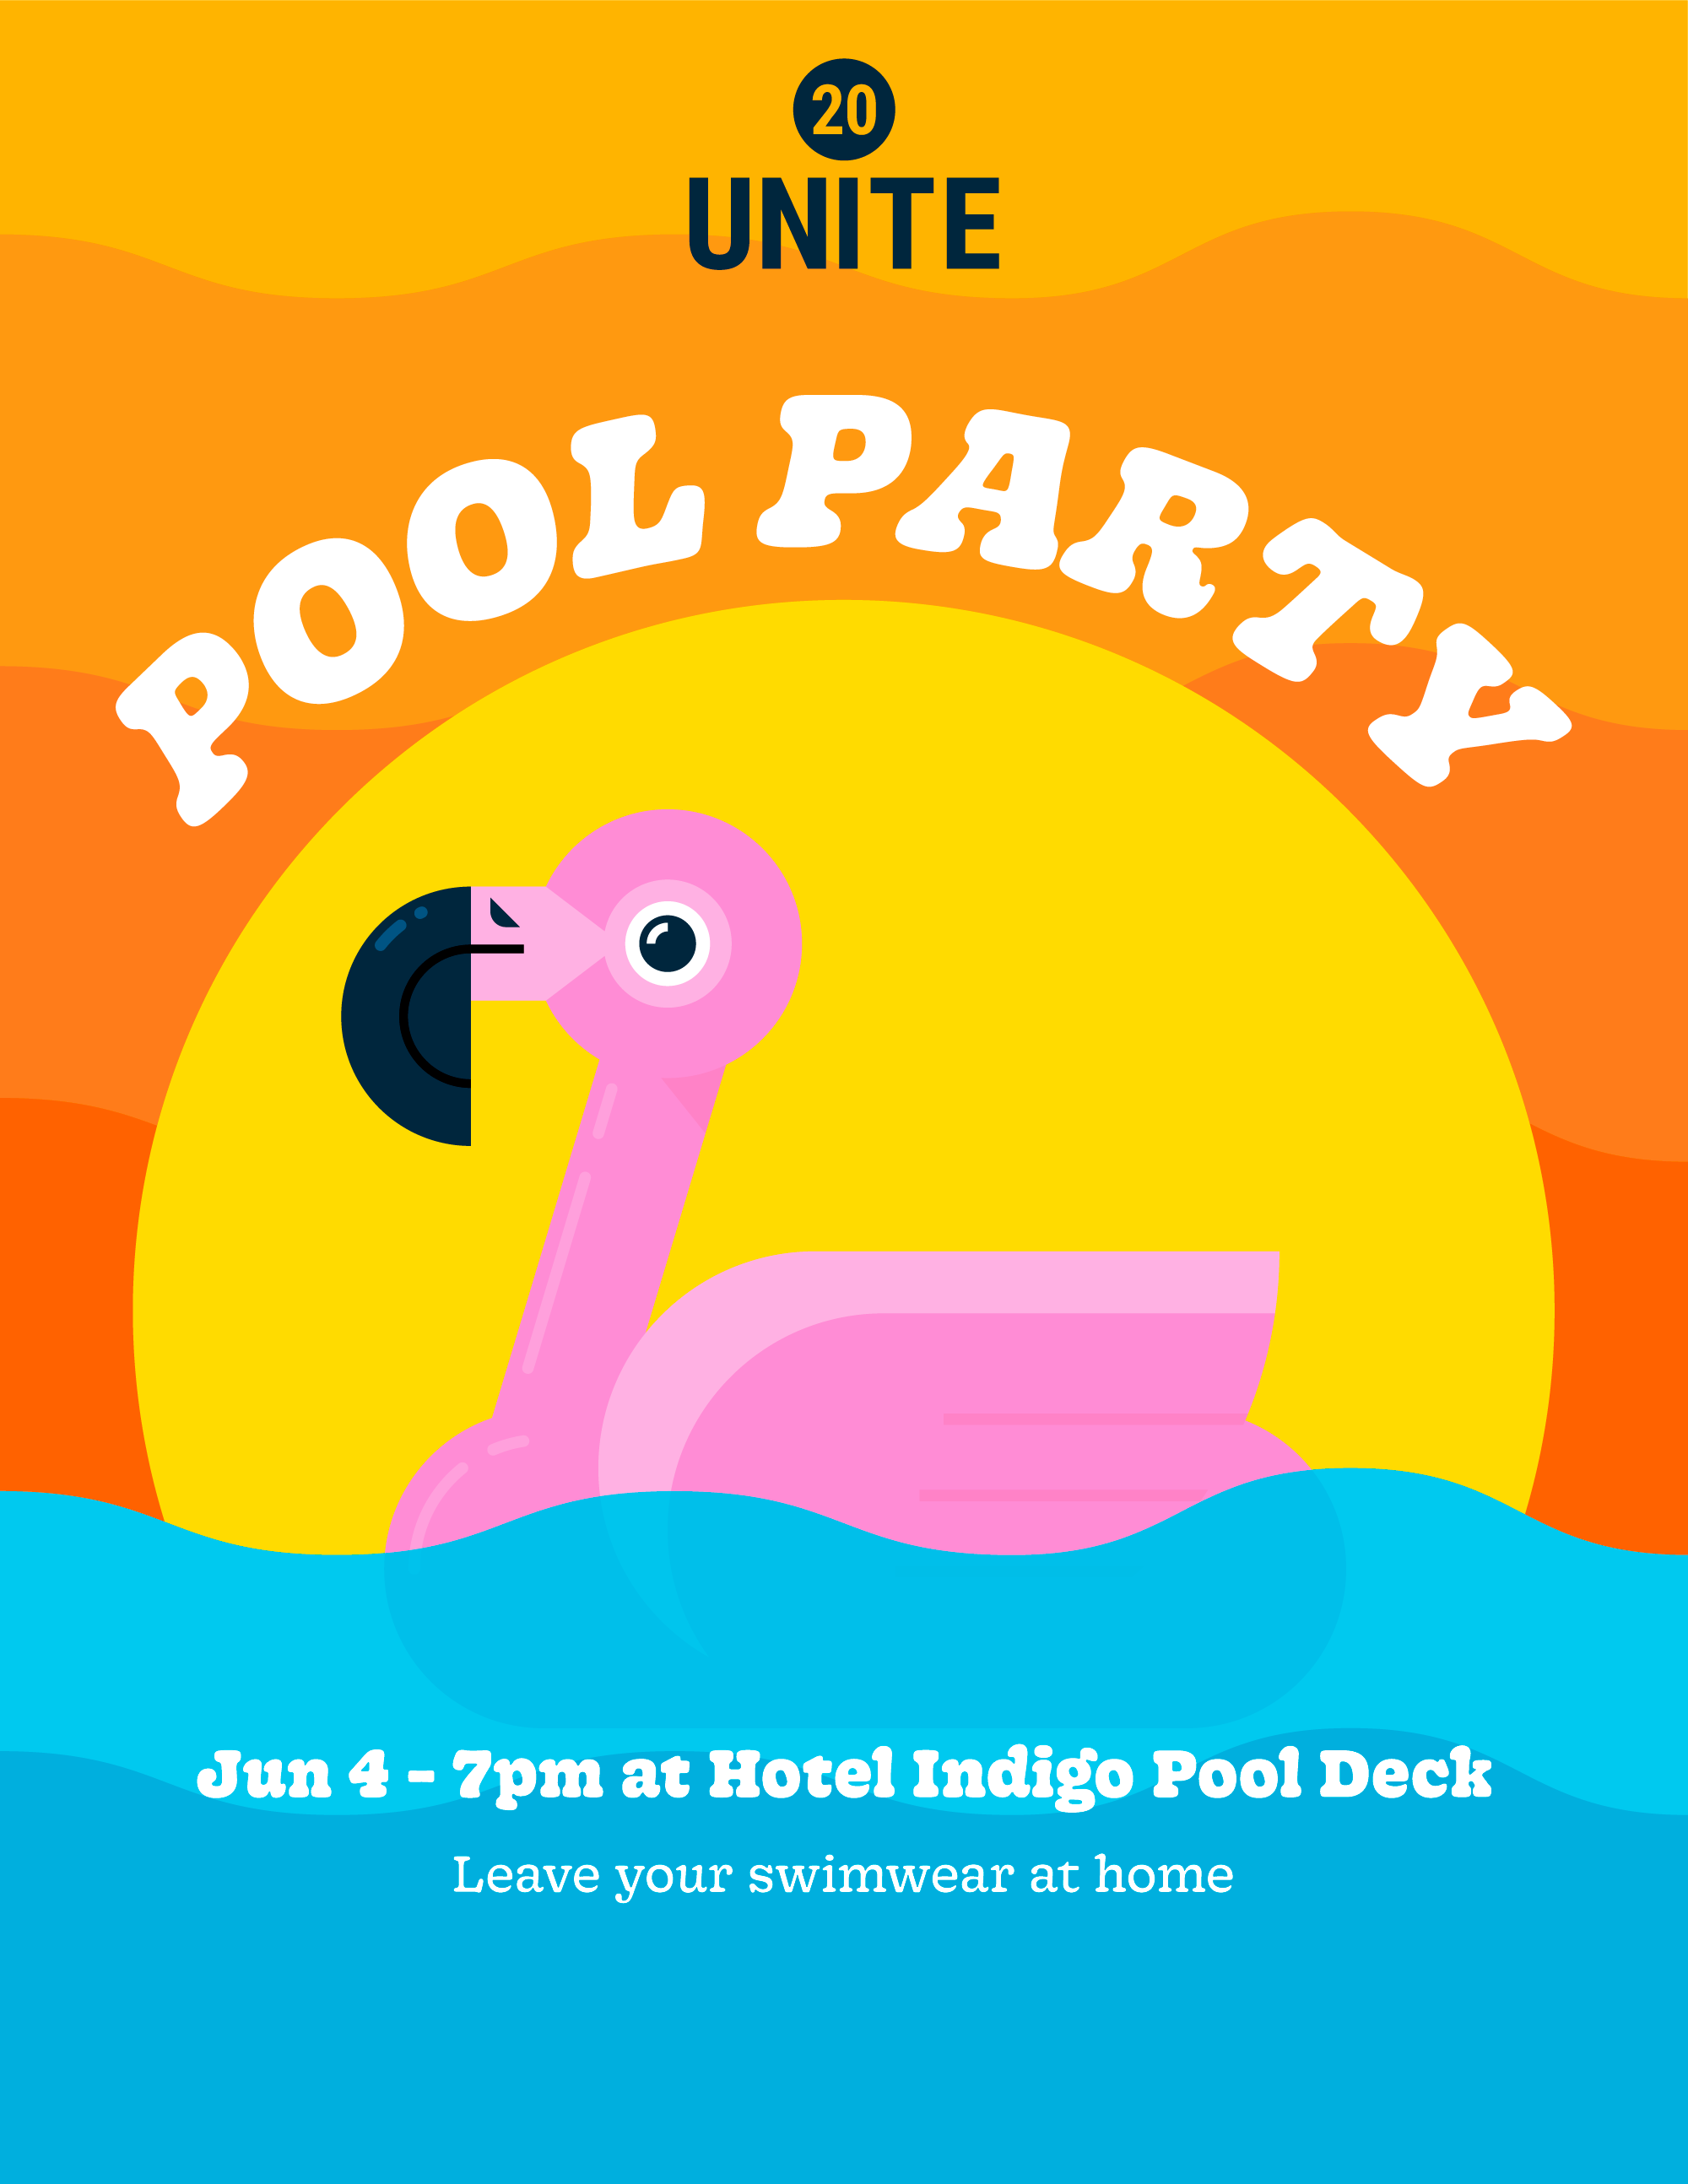 Unite 20 Pool Party